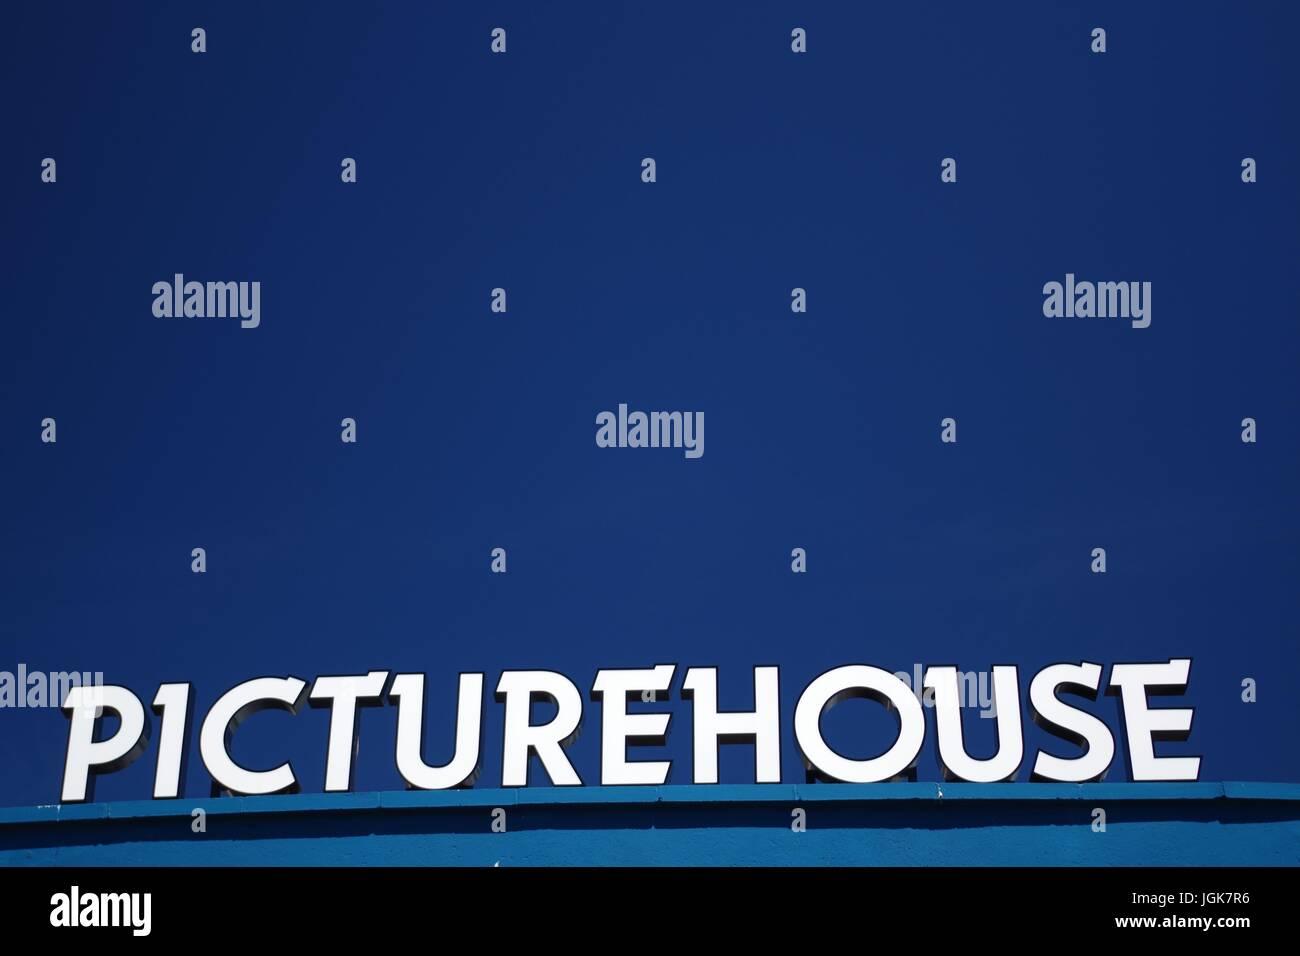 Picturehouse Cinema Sign, Exeter, Devon, UK. July, 2017. - Stock Image